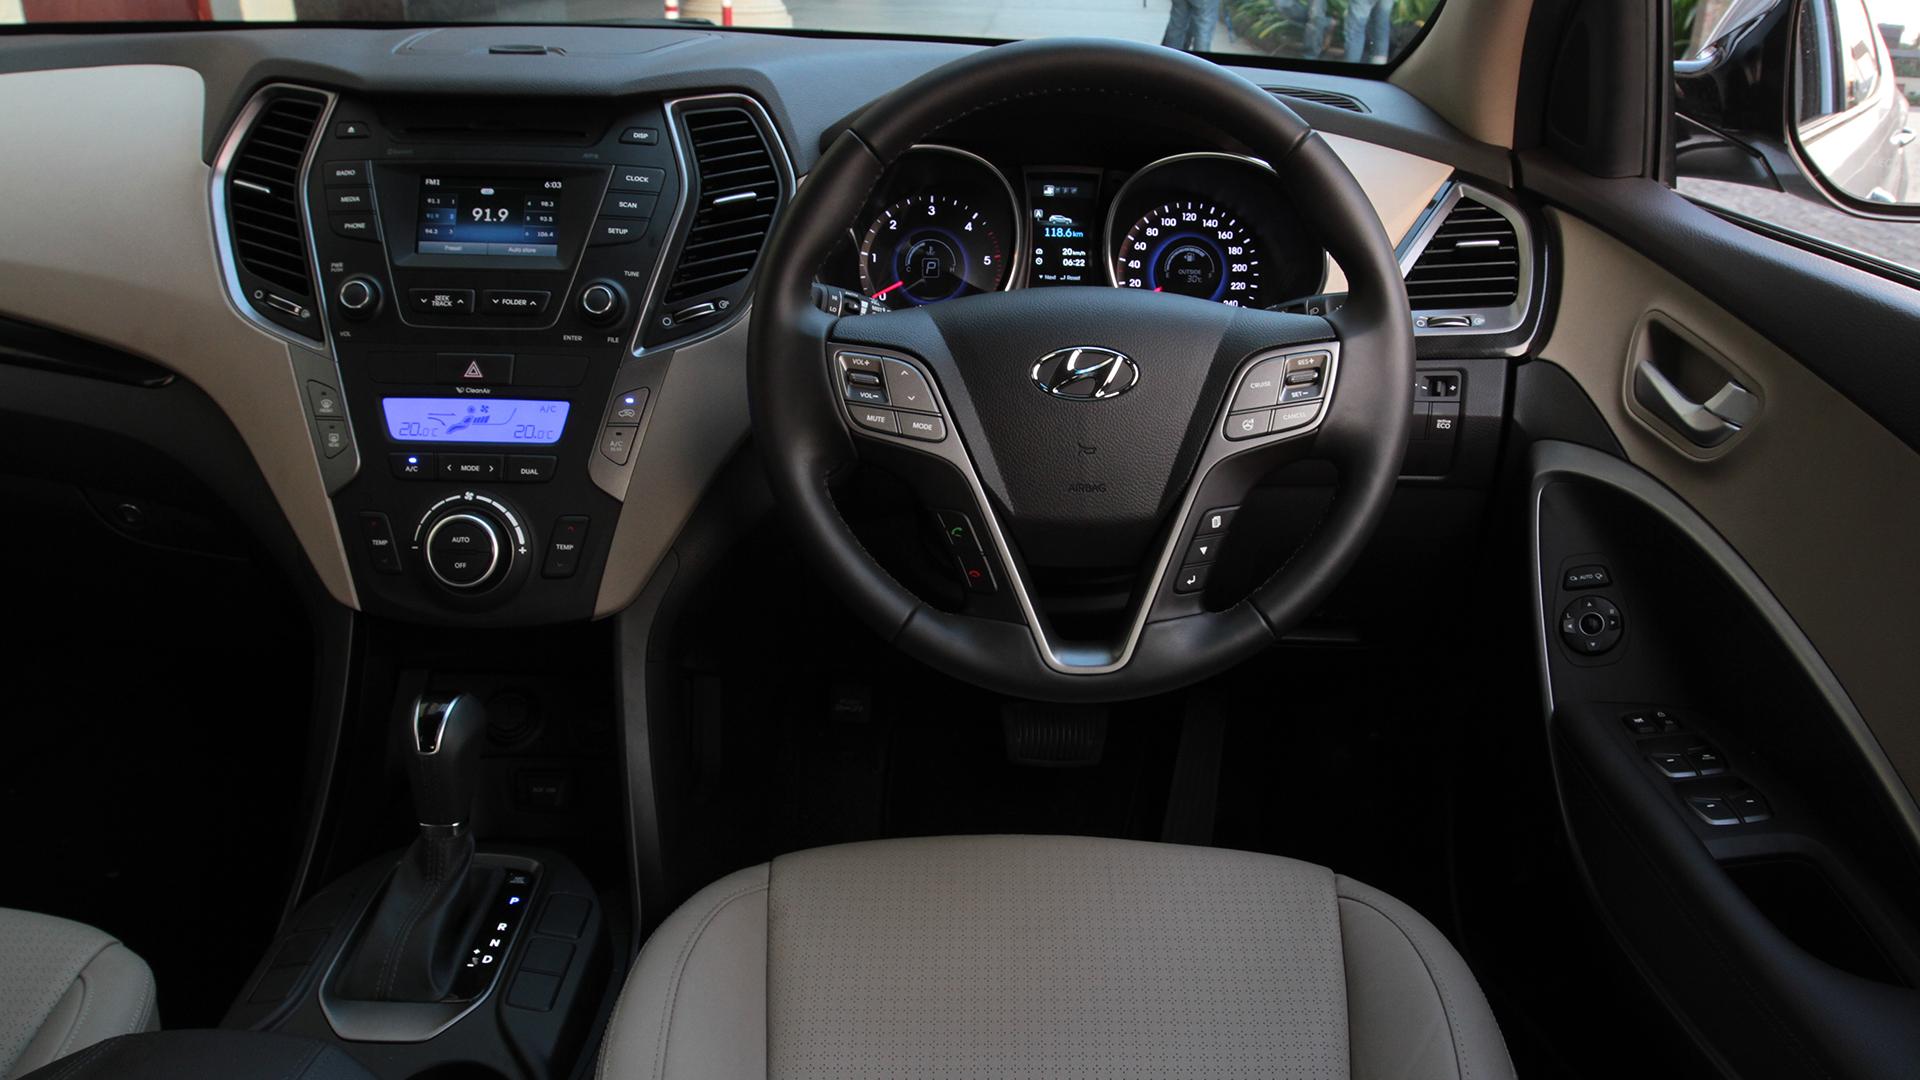 Hyundai Santa Fe 2014 2WD A/T Exterior